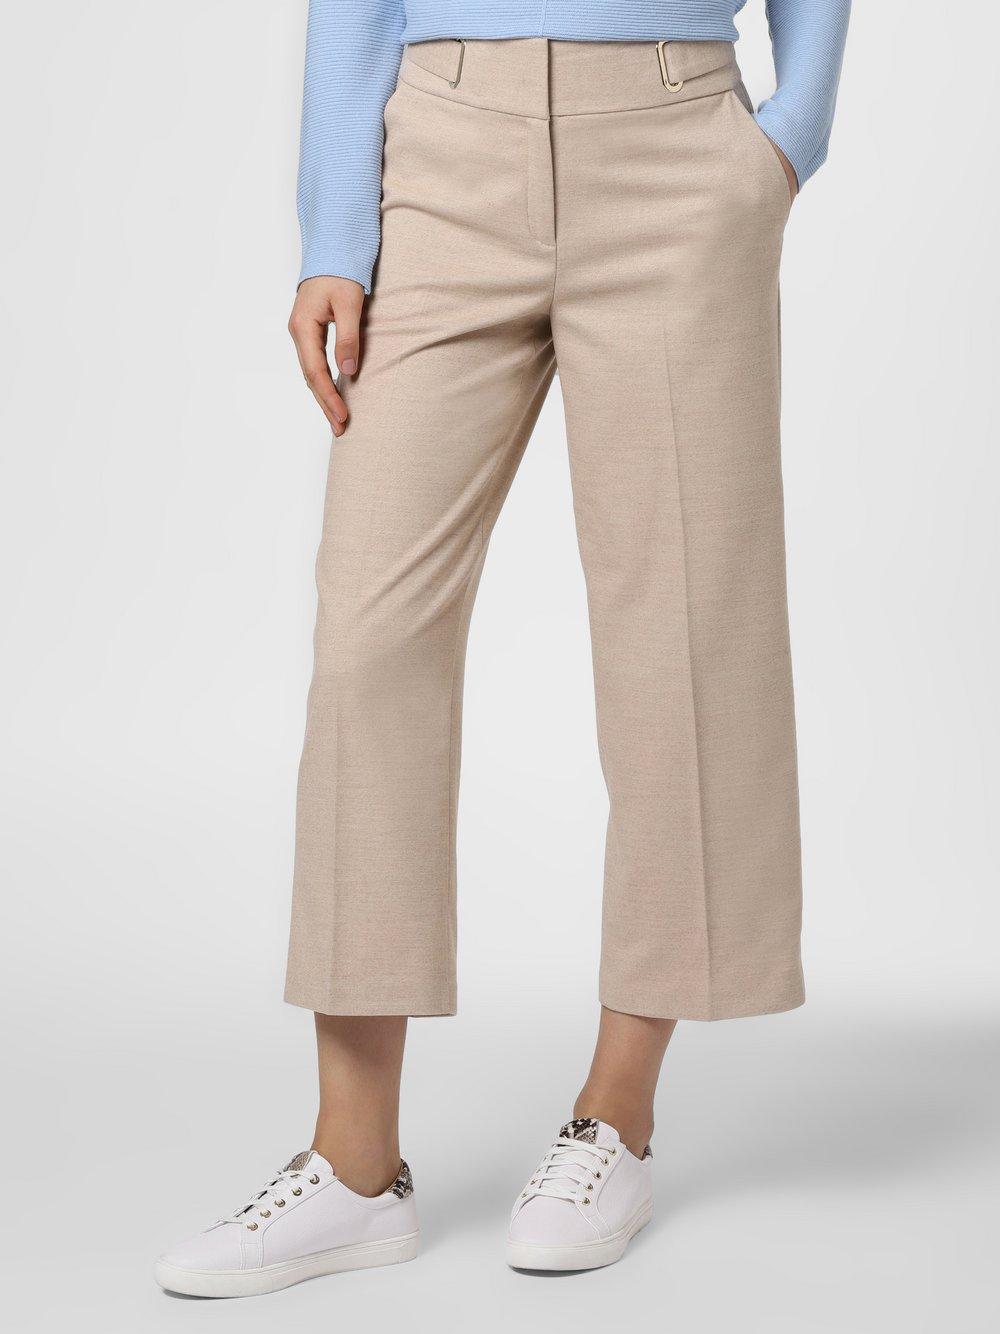 Esprit Collection – Spodnie damskie, beżowy Van Graaf 463041-0001